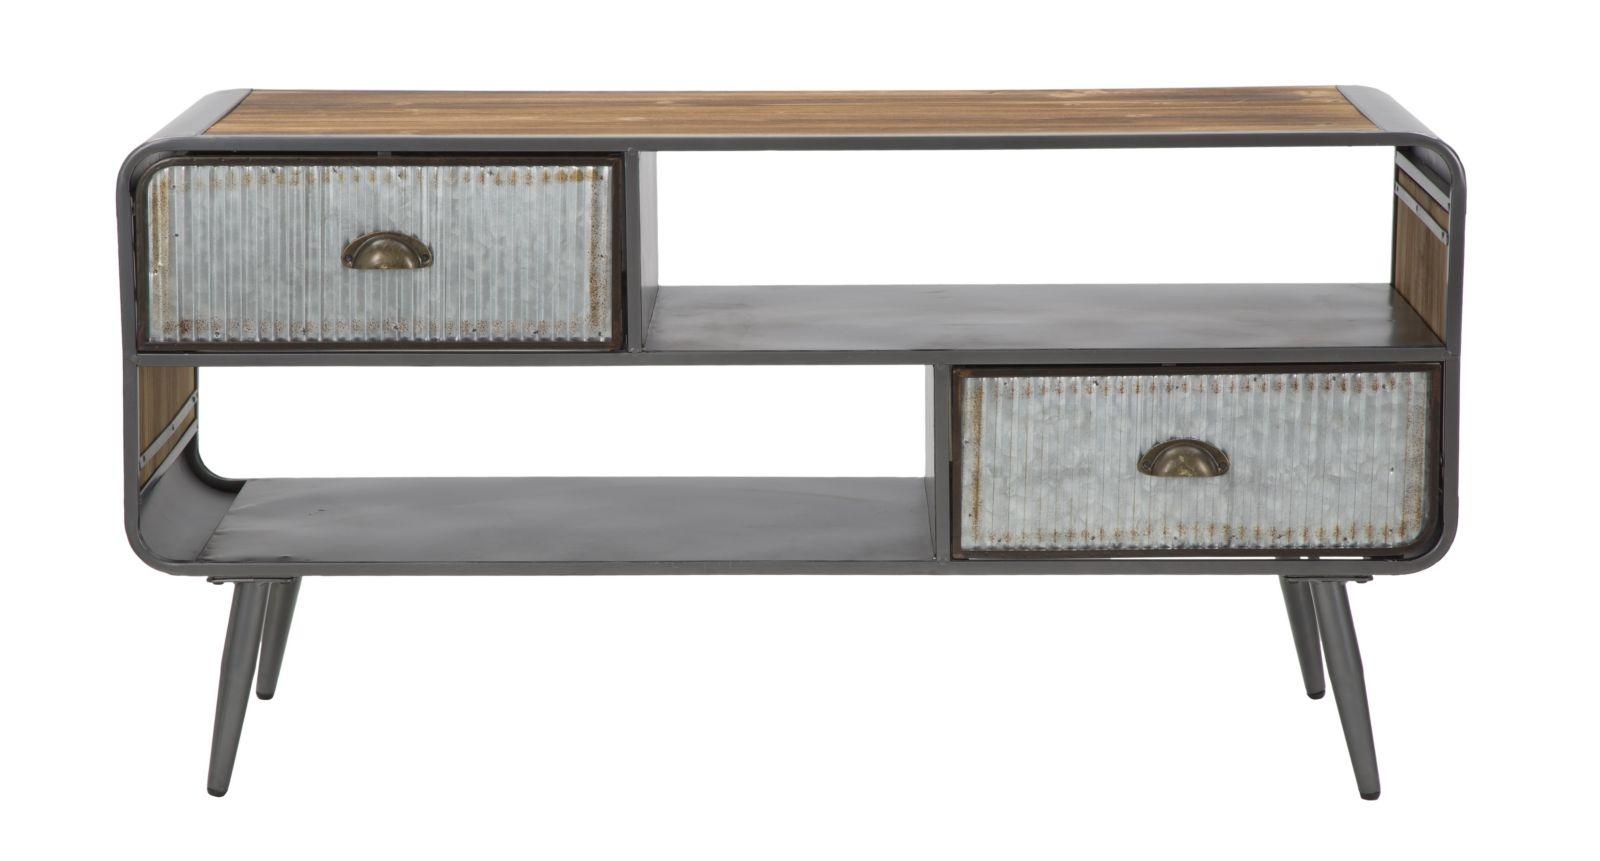 Comoda TV din lemn de brad si metal cu 2 sertare Illinois Grey / Natural, l40xA120,5xH61 cm